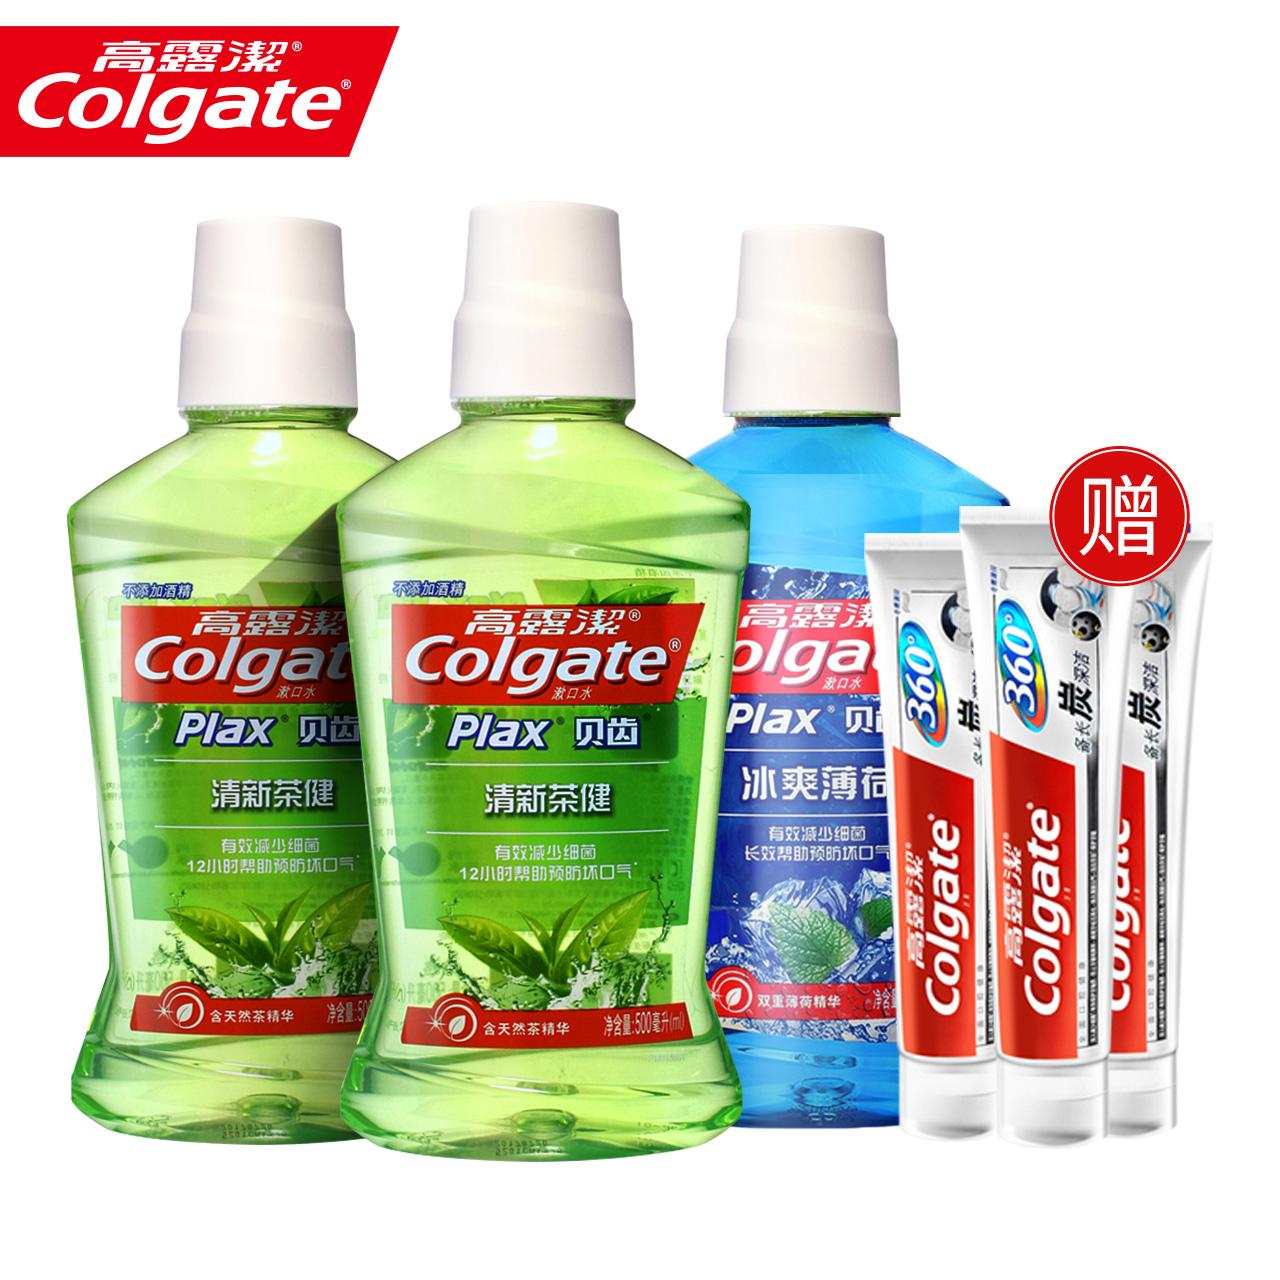 Colgate/高露洁 漱口水 500ml*3瓶 35.9元包邮